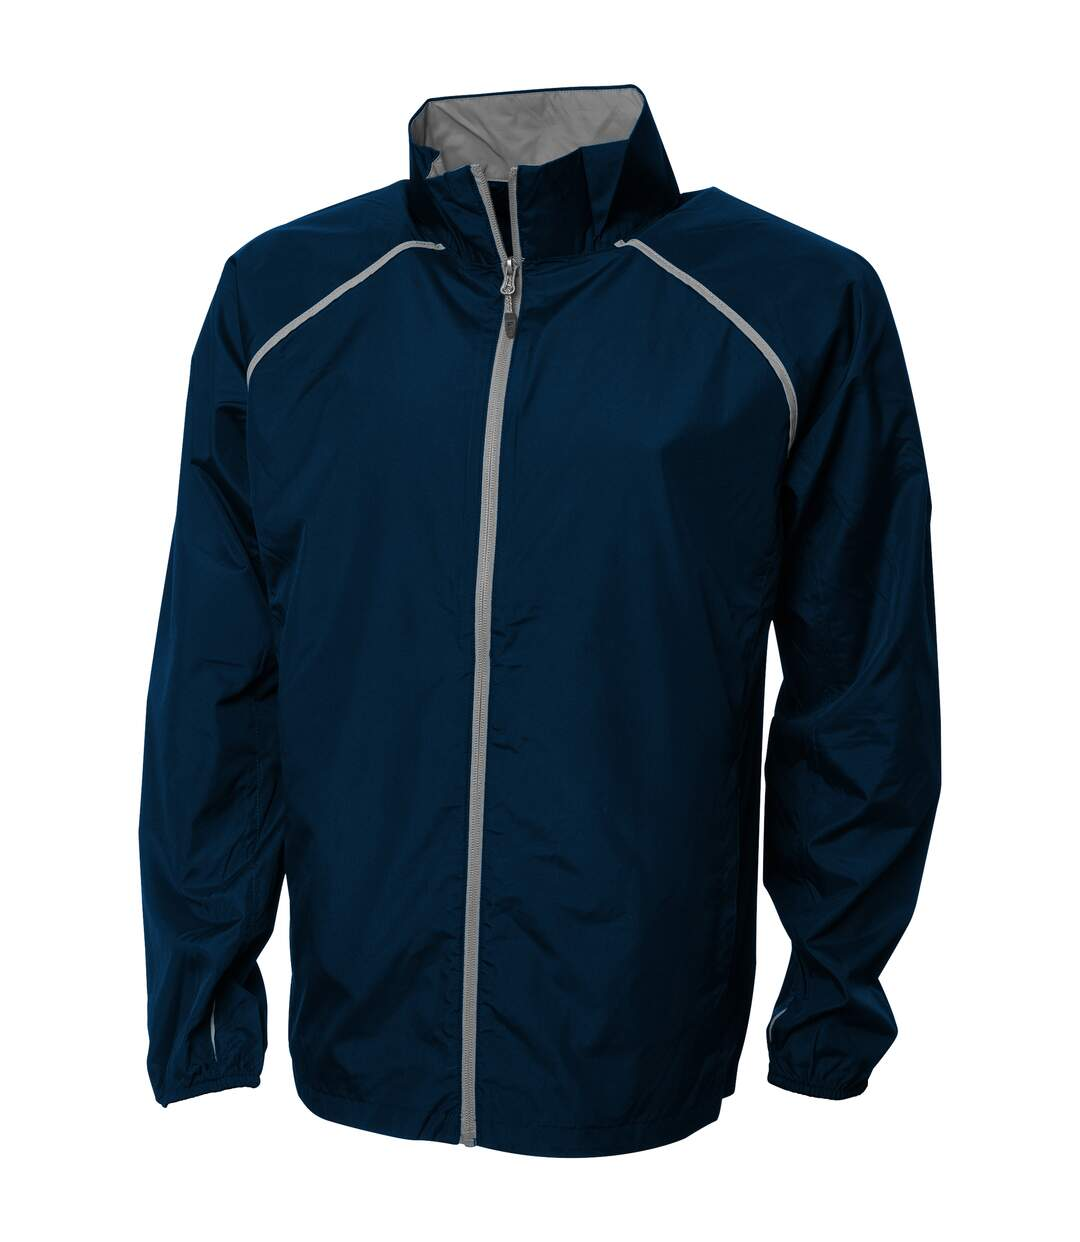 Elevate Mens Egmont Packable Jacket (Navy) - UTPF1862